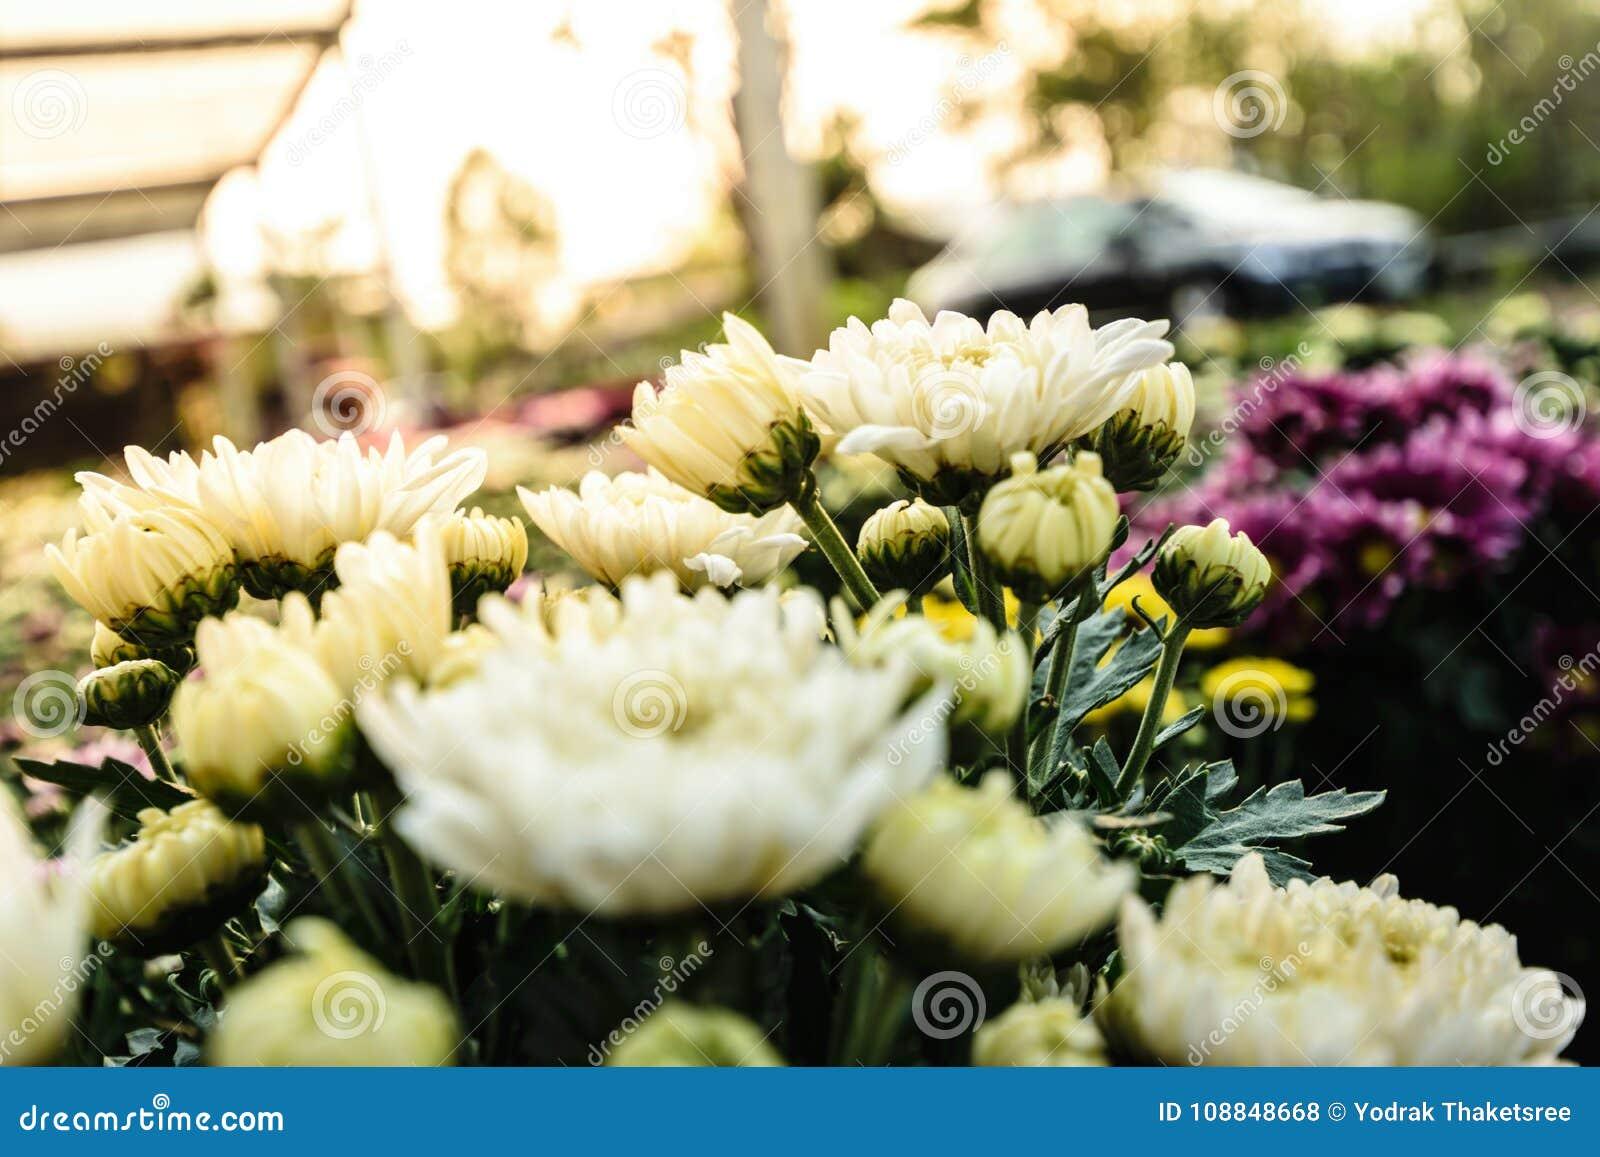 White Chrysanthemum Flower Stock Photo Image Of Background 108848668